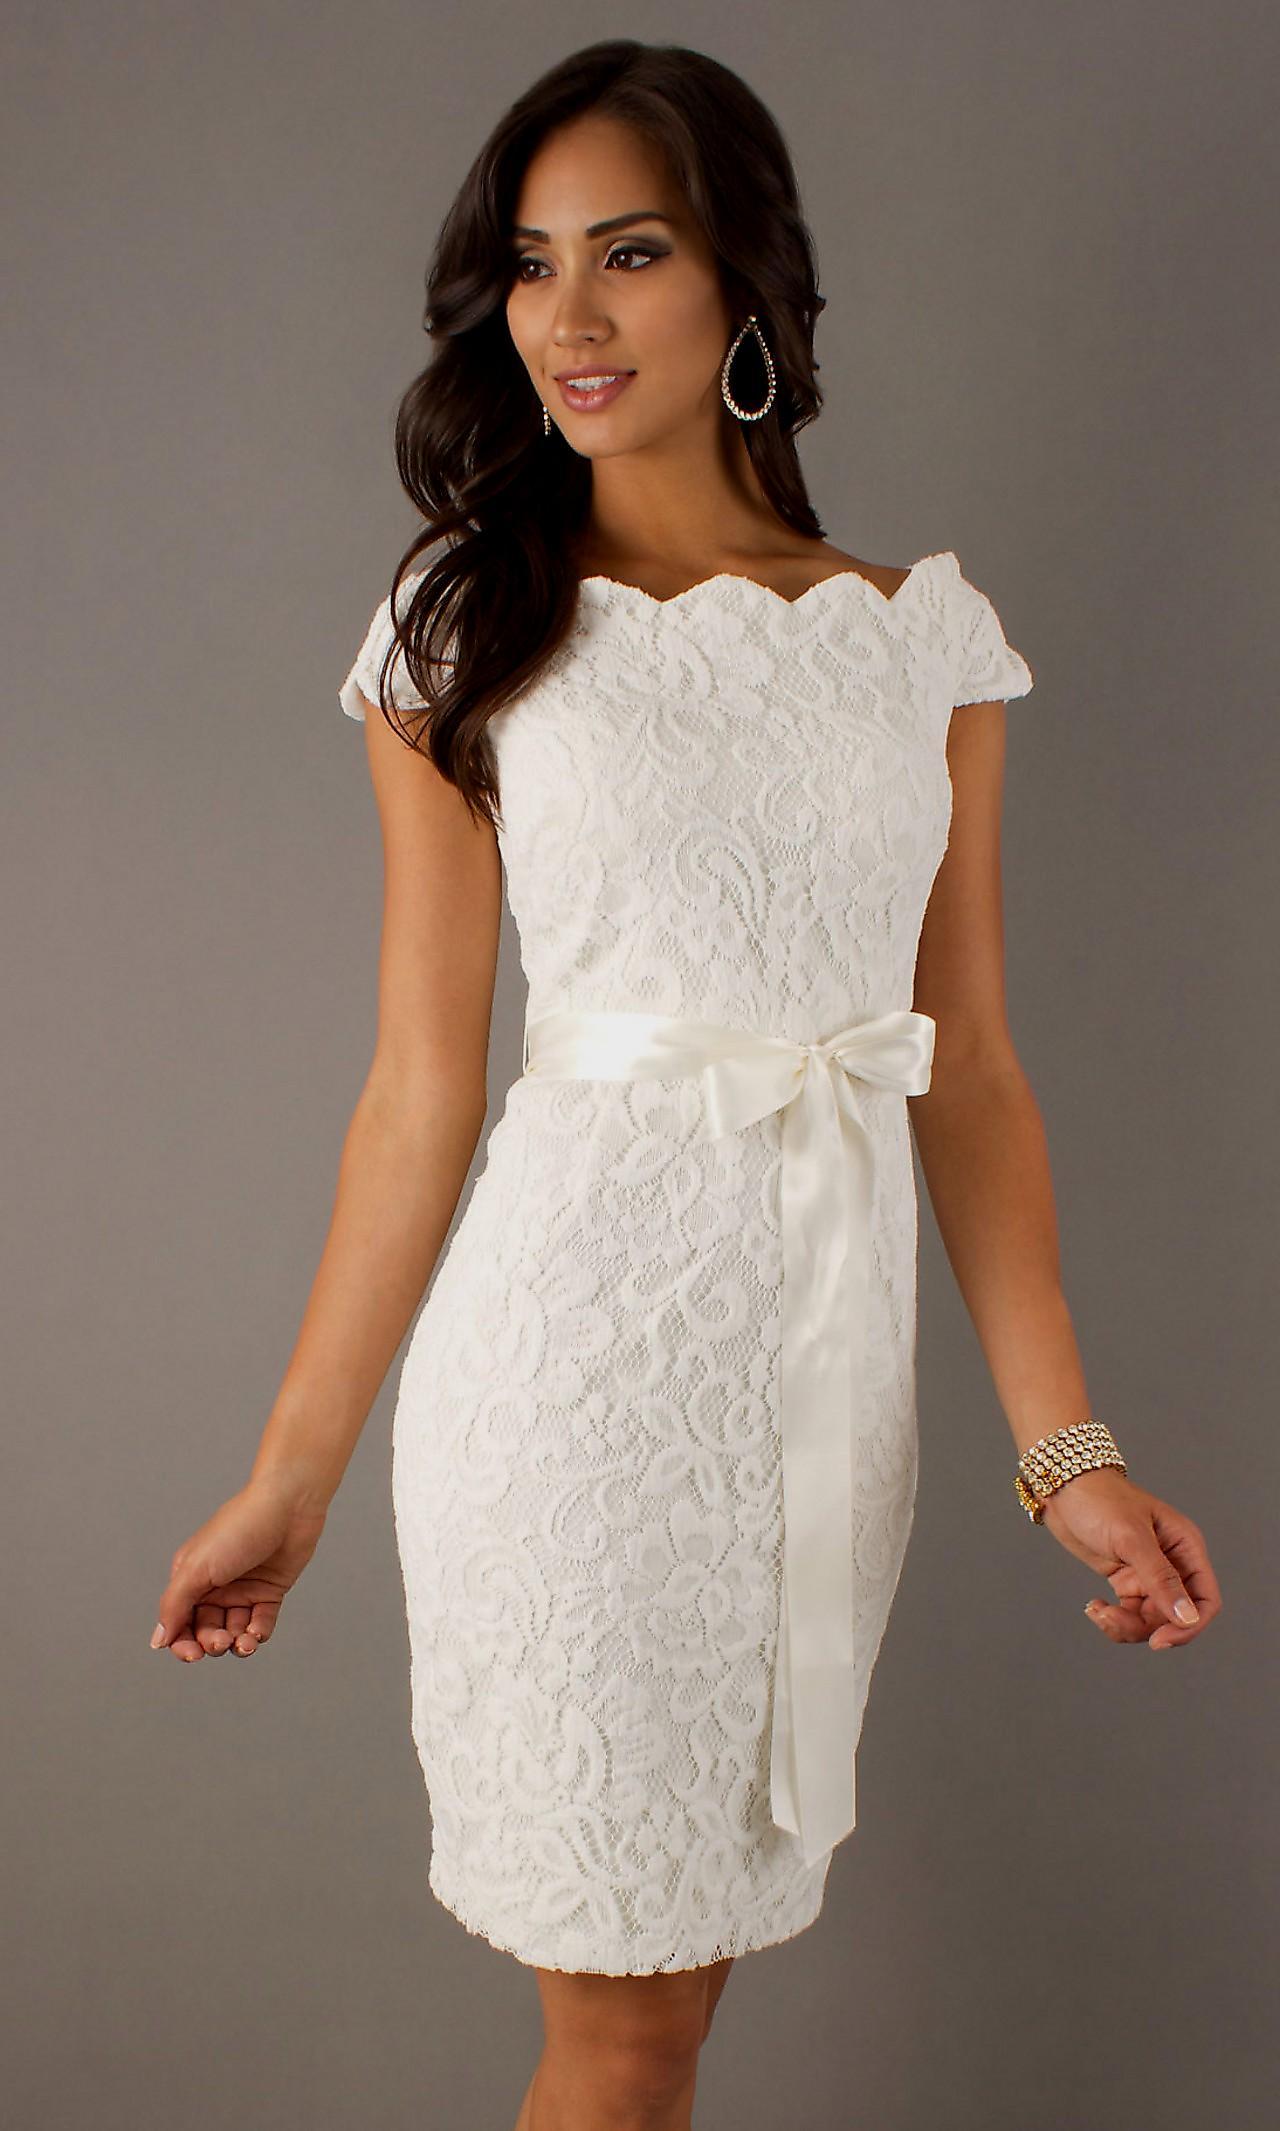 short white dresses beautiful evening dress blogs: short white dress with lace tejvpoa